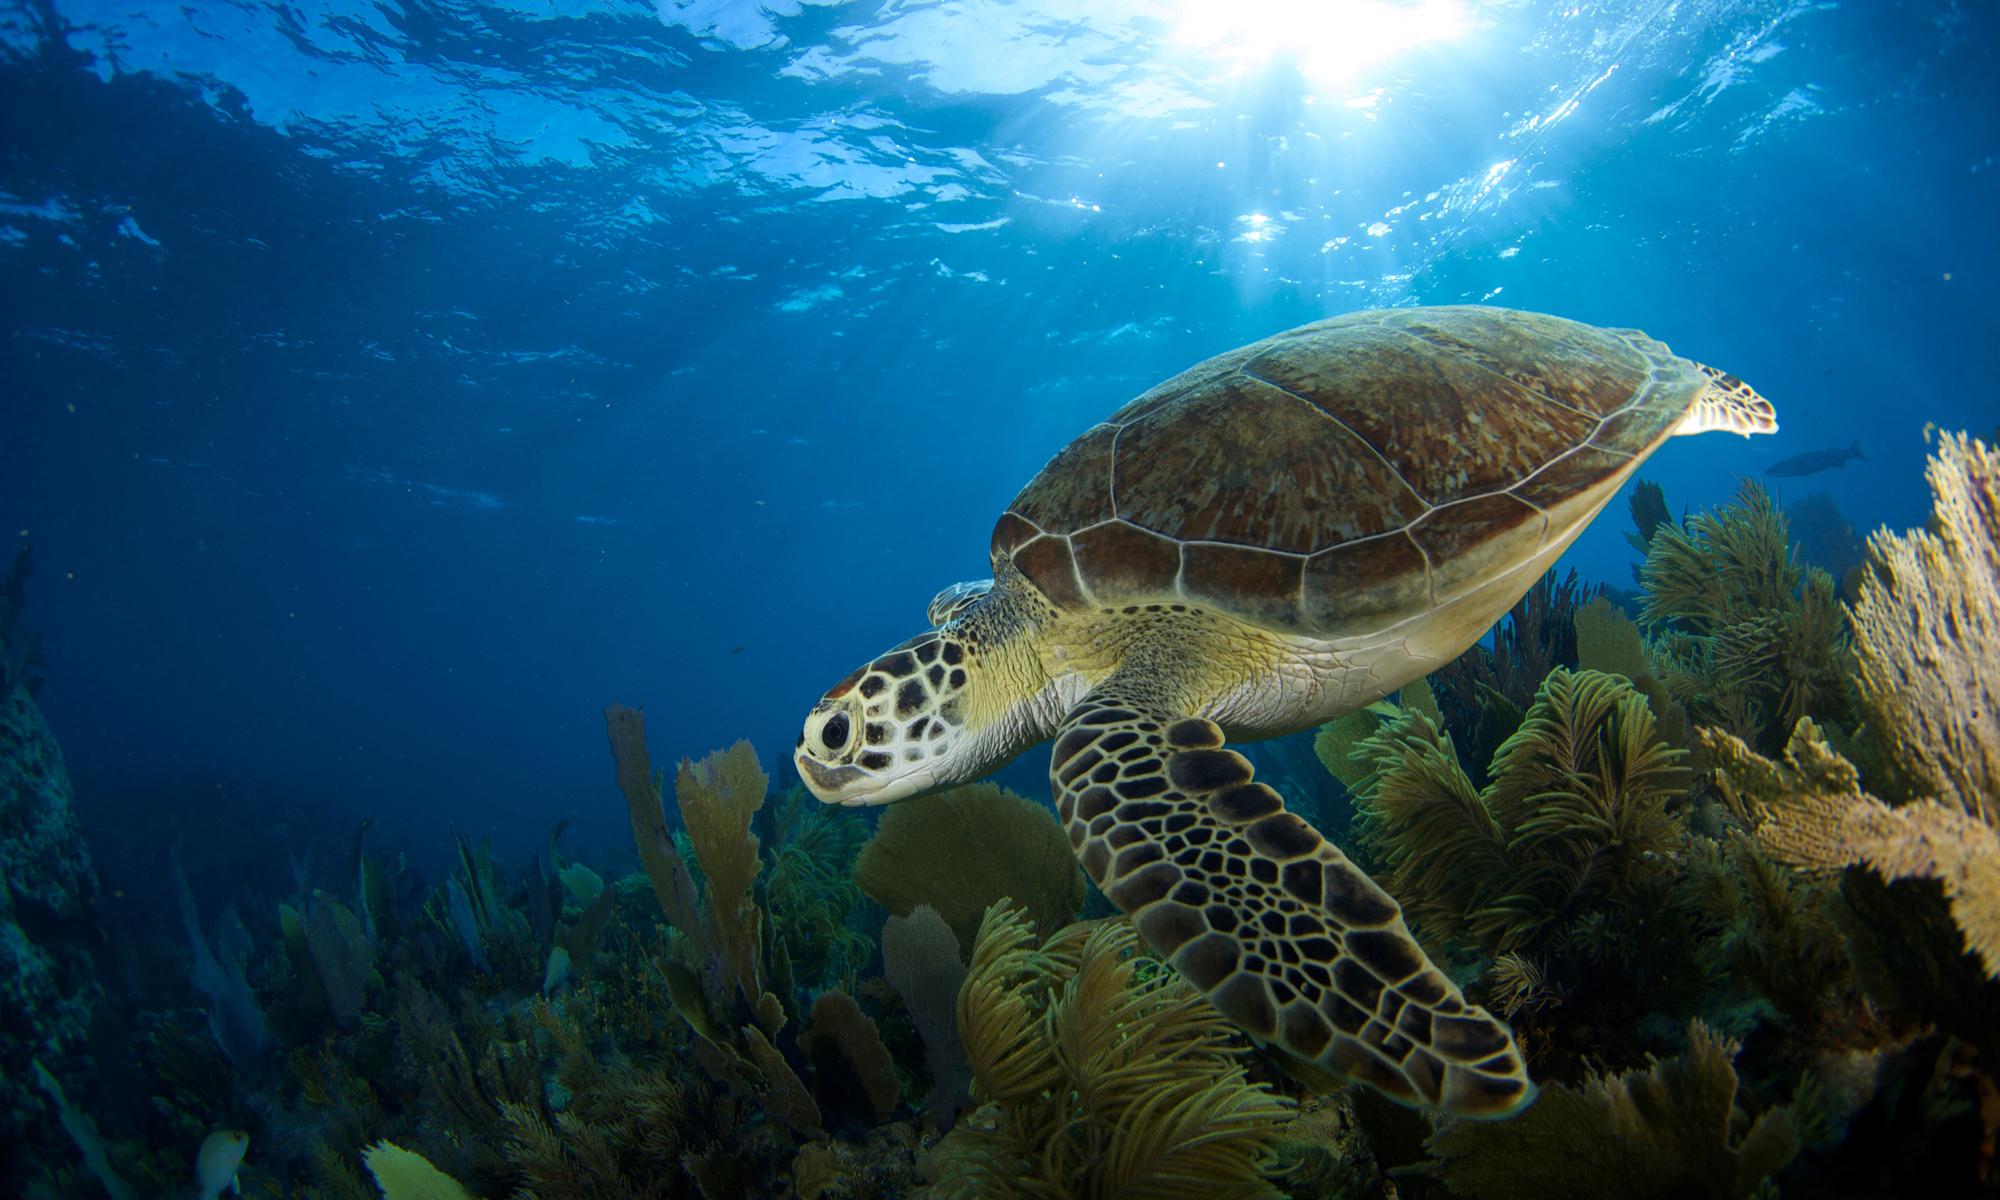 Sea turtle in Florida Keys